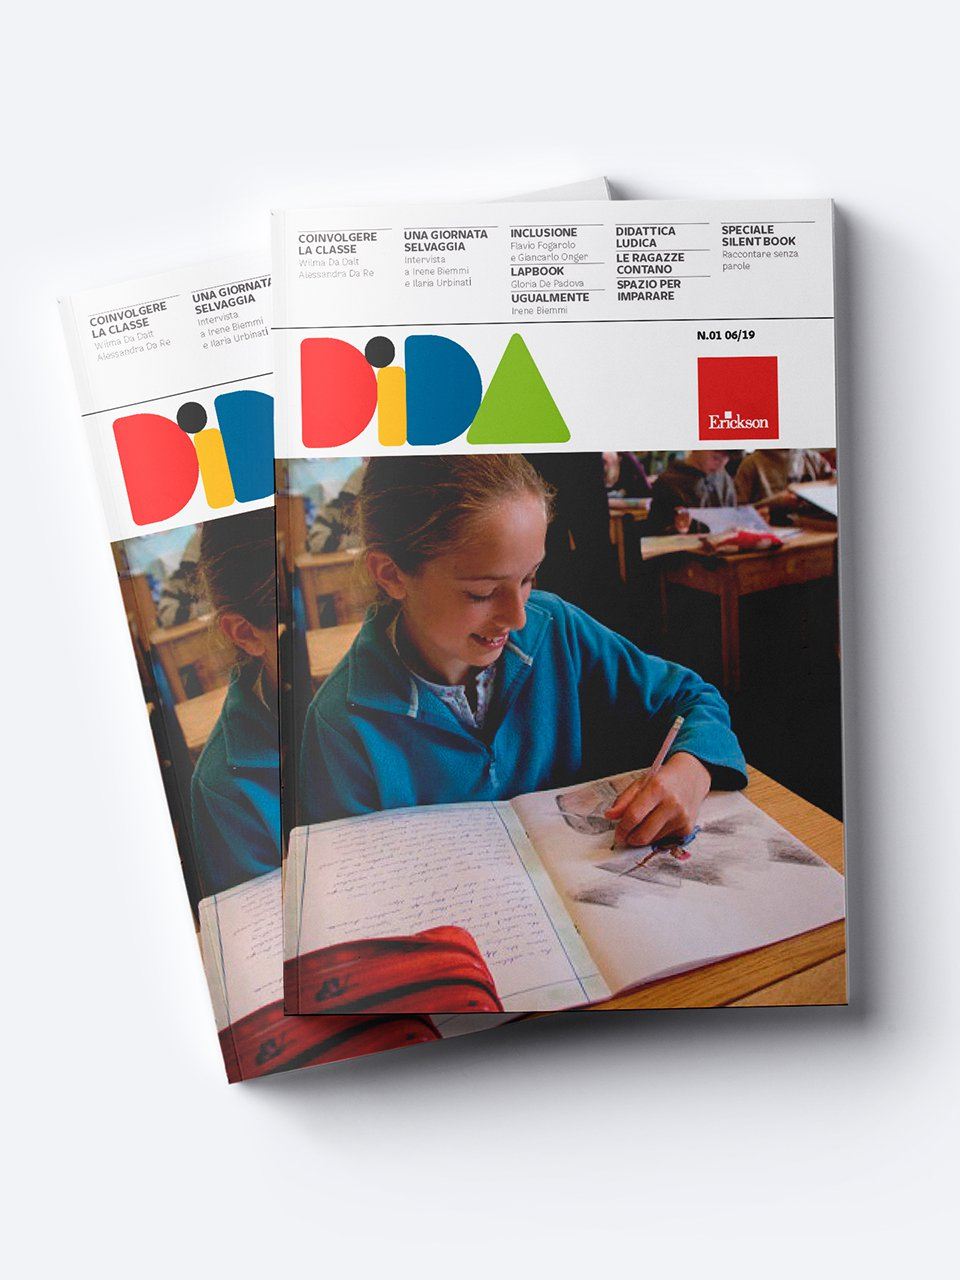 DIDA - Annata 2019-2020 - Non ci sto più dentro! - Libri - Erickson